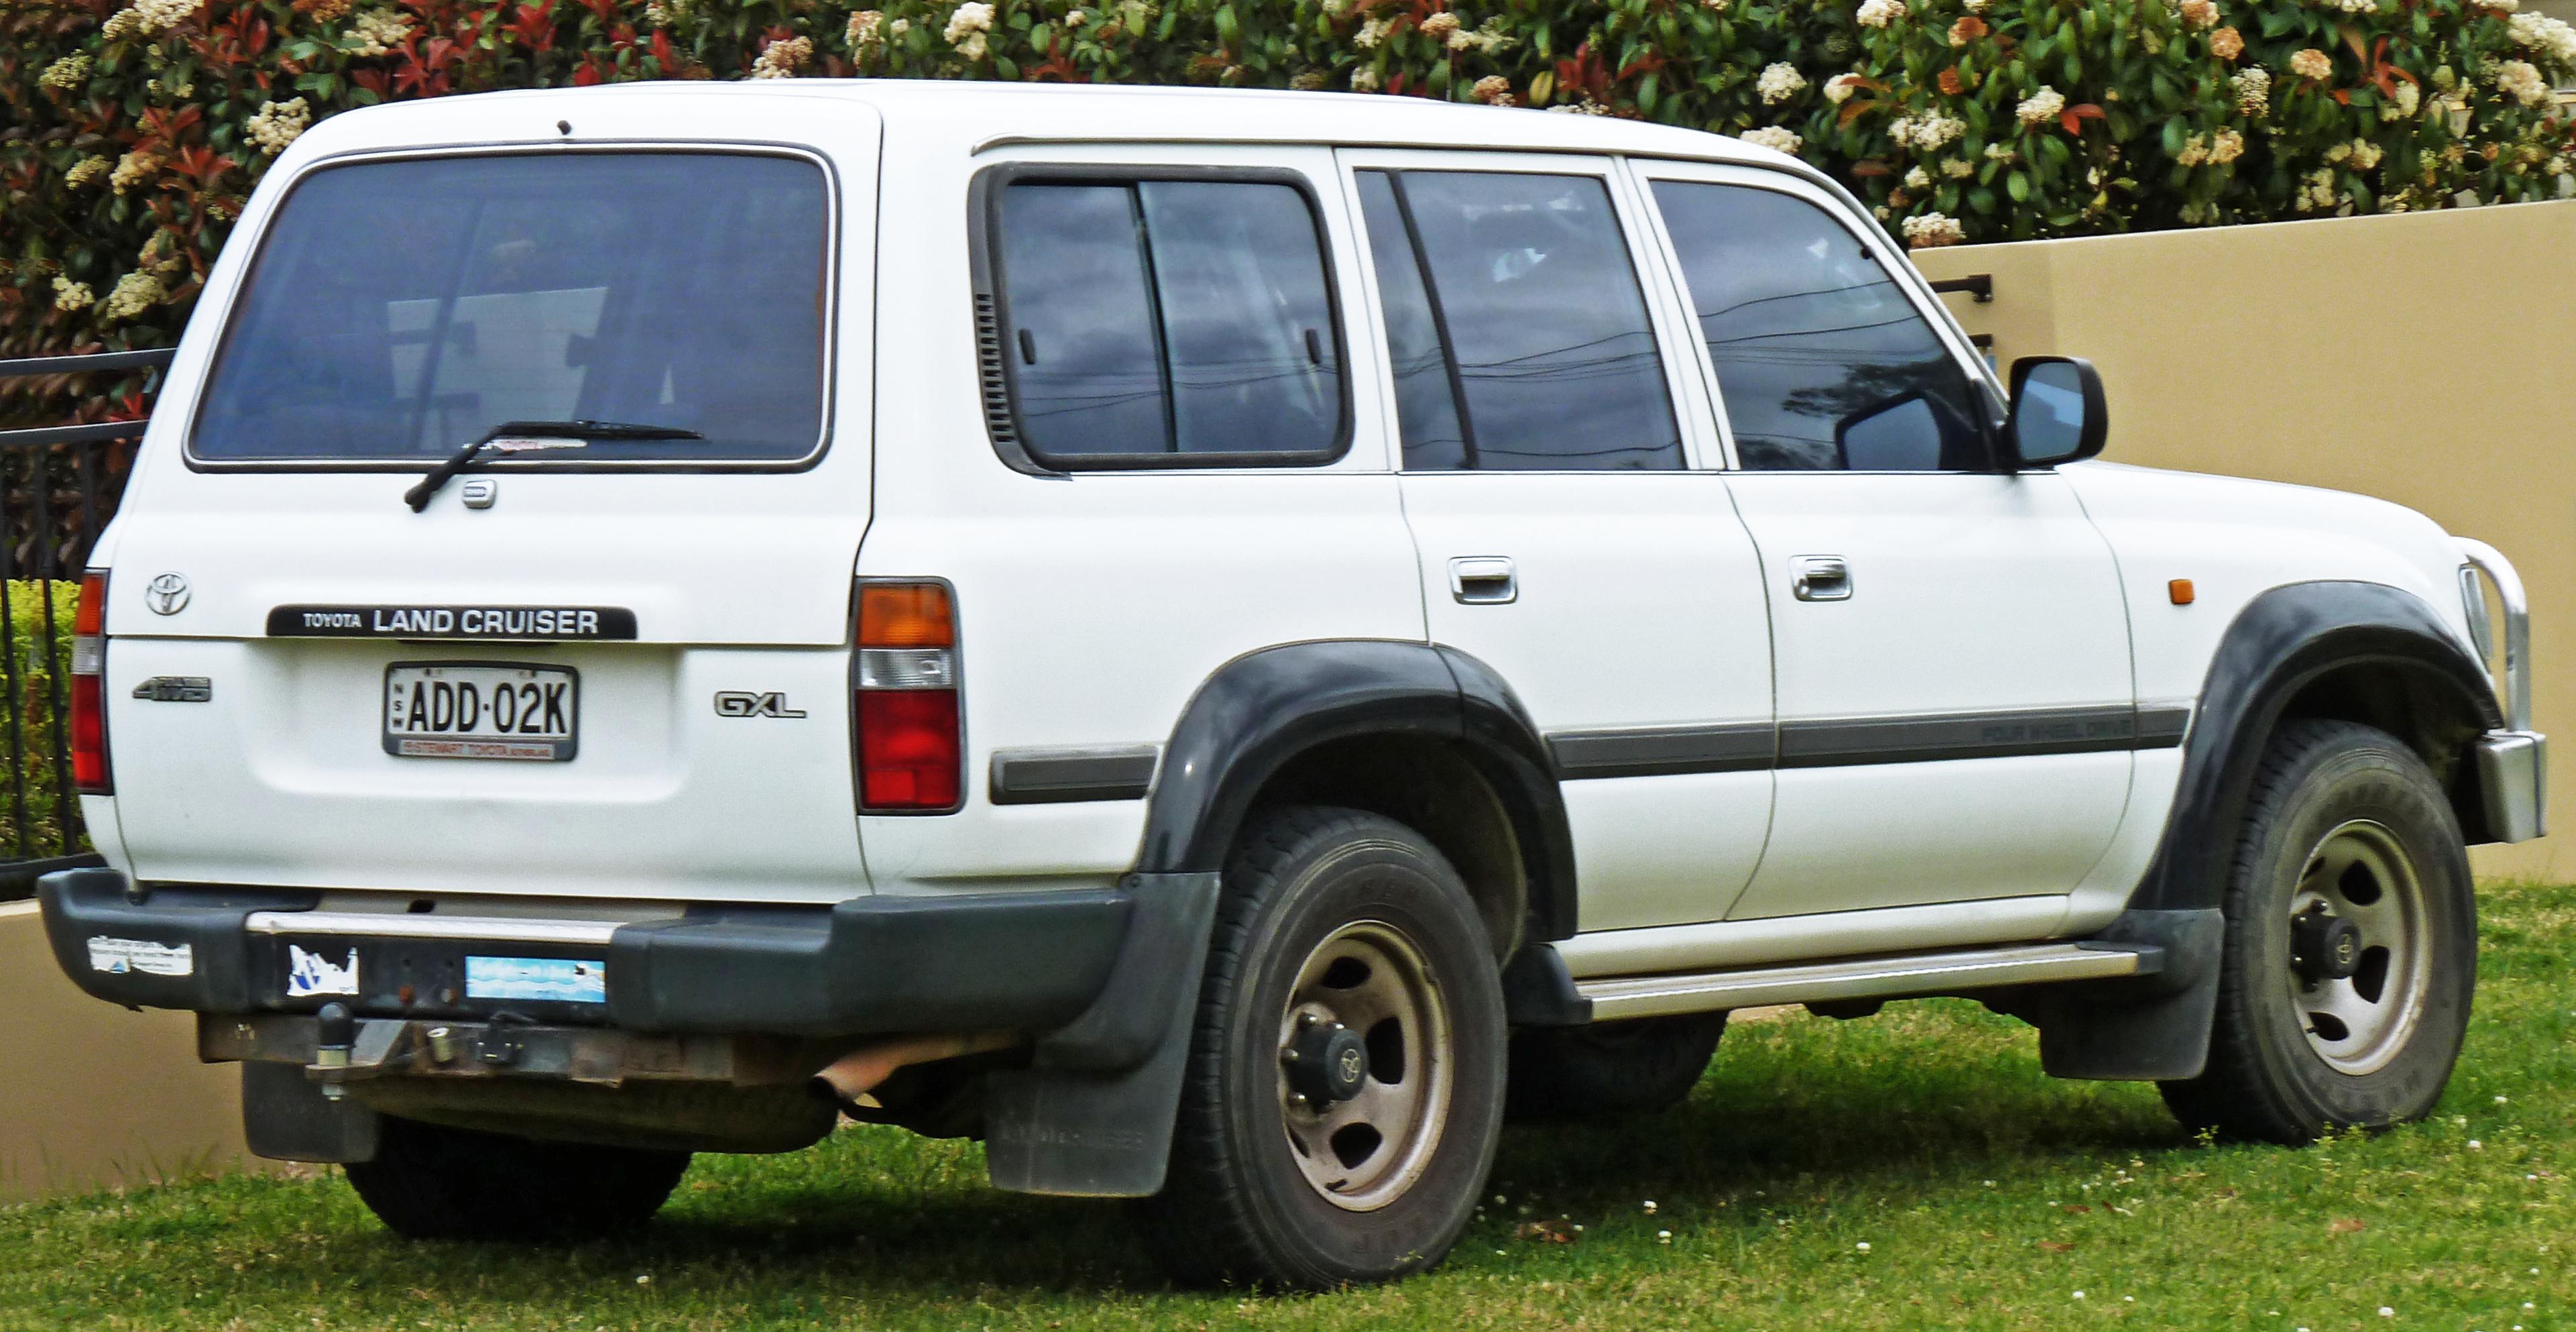 Toyota Land Cruiser Wiki >> File:1995-1998 Toyota Land Cruiser (HZJ80R) GXL wagon (2010-10-01) 02.jpg - Wikimedia Commons